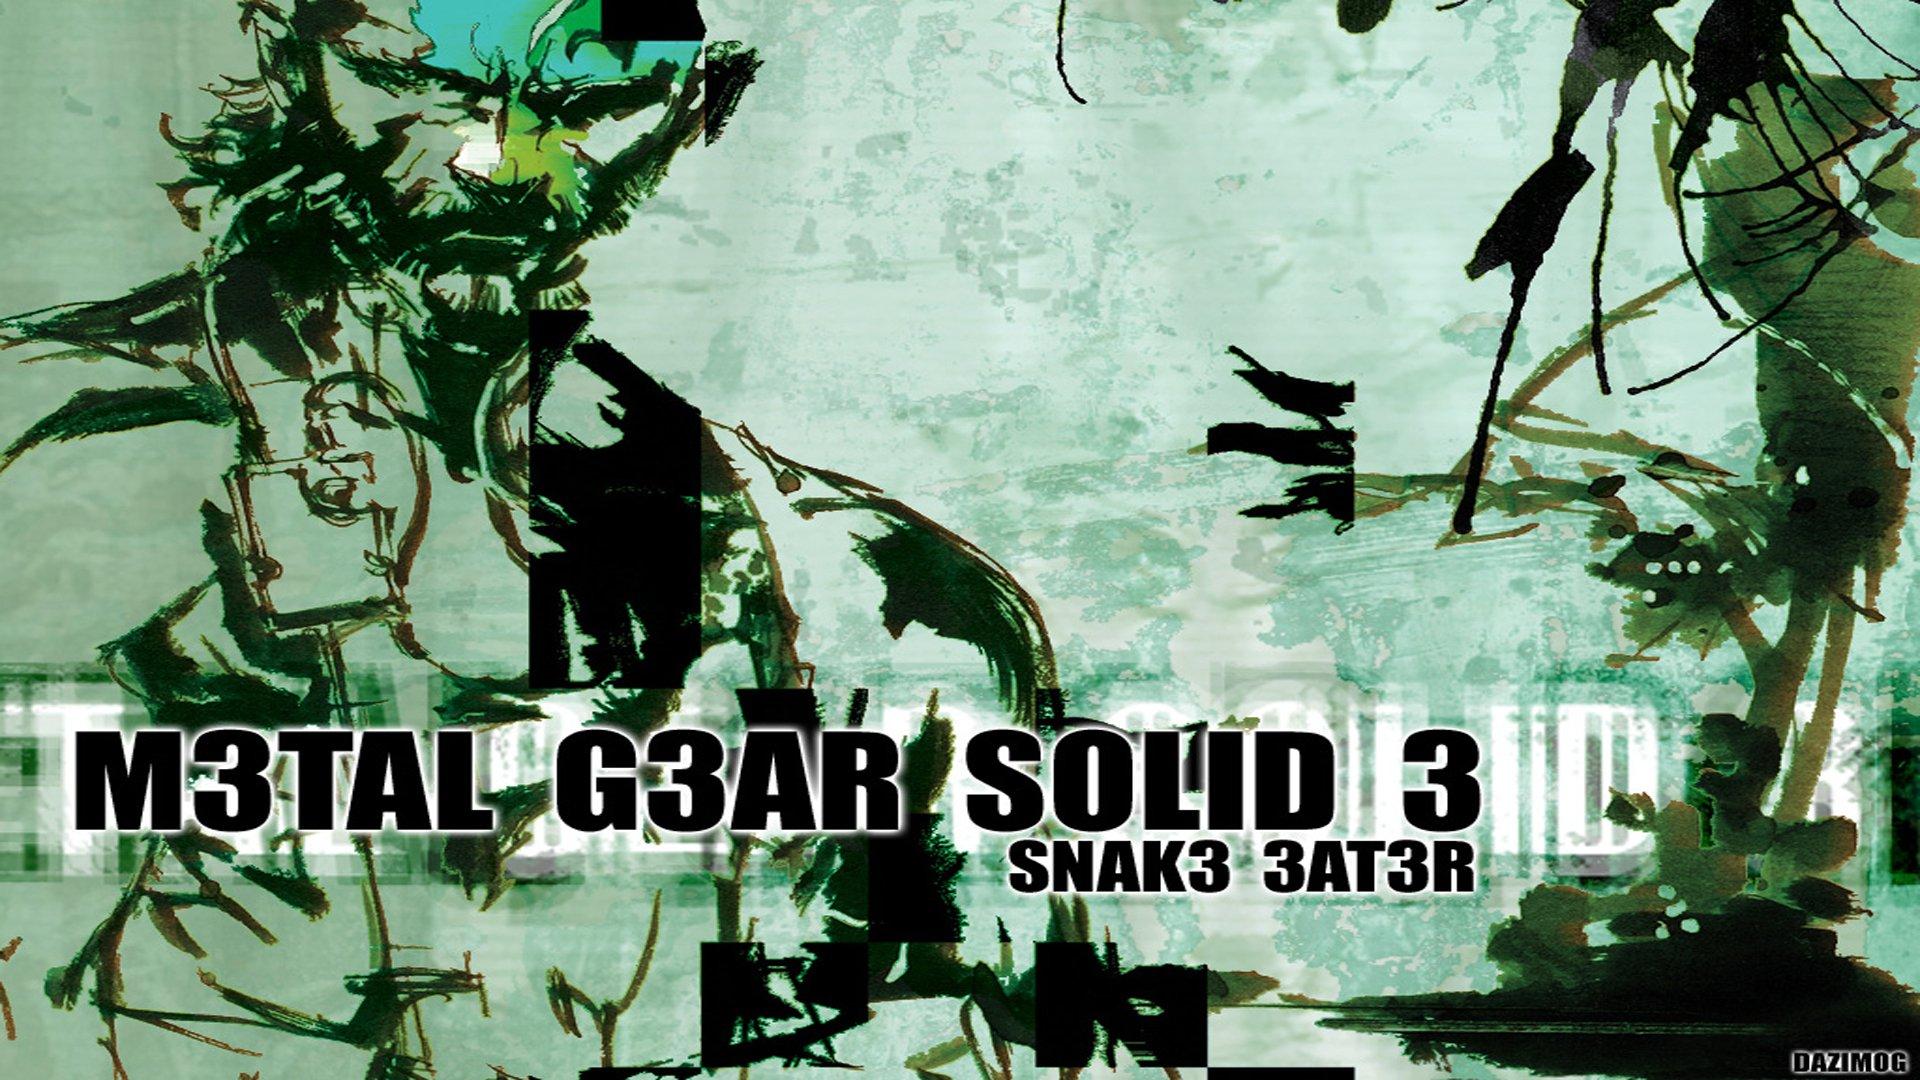 Metal Gear Solid Iphone Wallpaper Metal Gear Solid 3 Snake Eater Hd Wallpaper Background